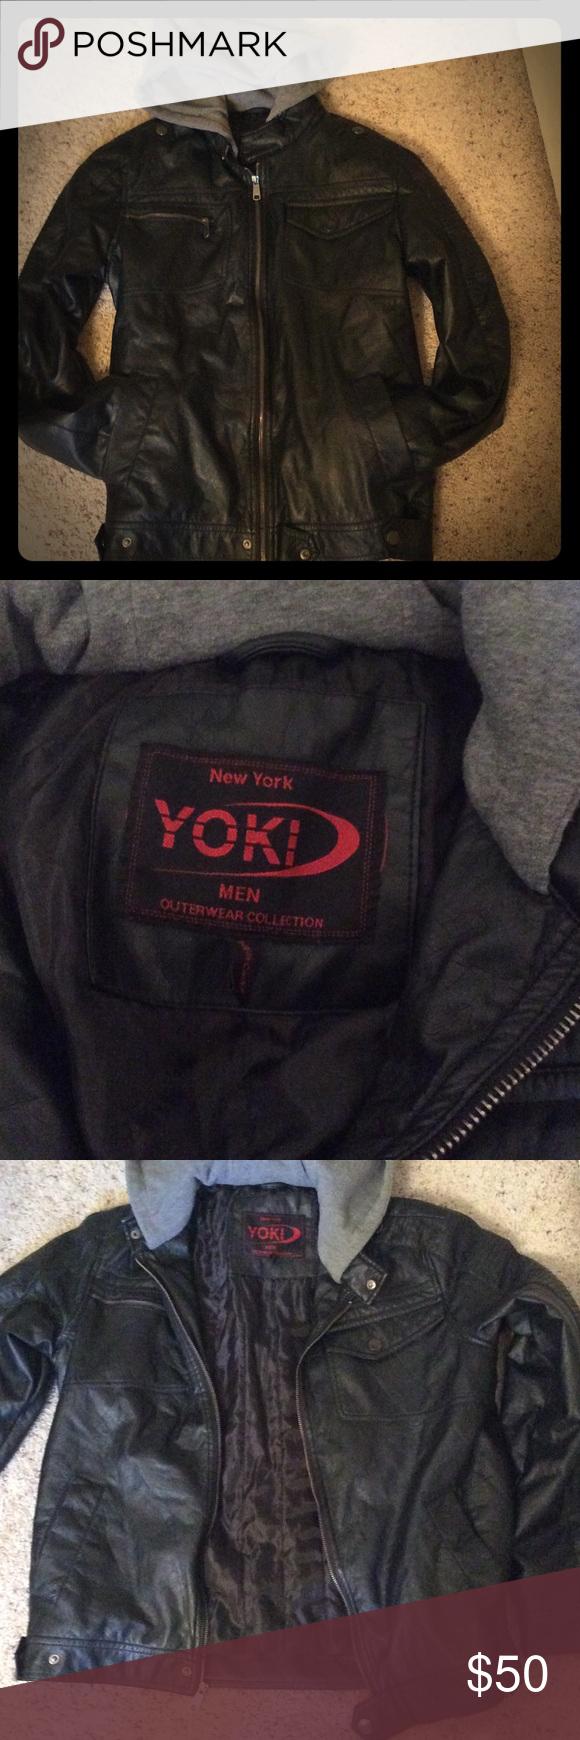 Nwot Men S Sz S Yoki Black Lined Hooded Jacket Cute Jackets Jackets Hooded Jacket [ 1740 x 580 Pixel ]